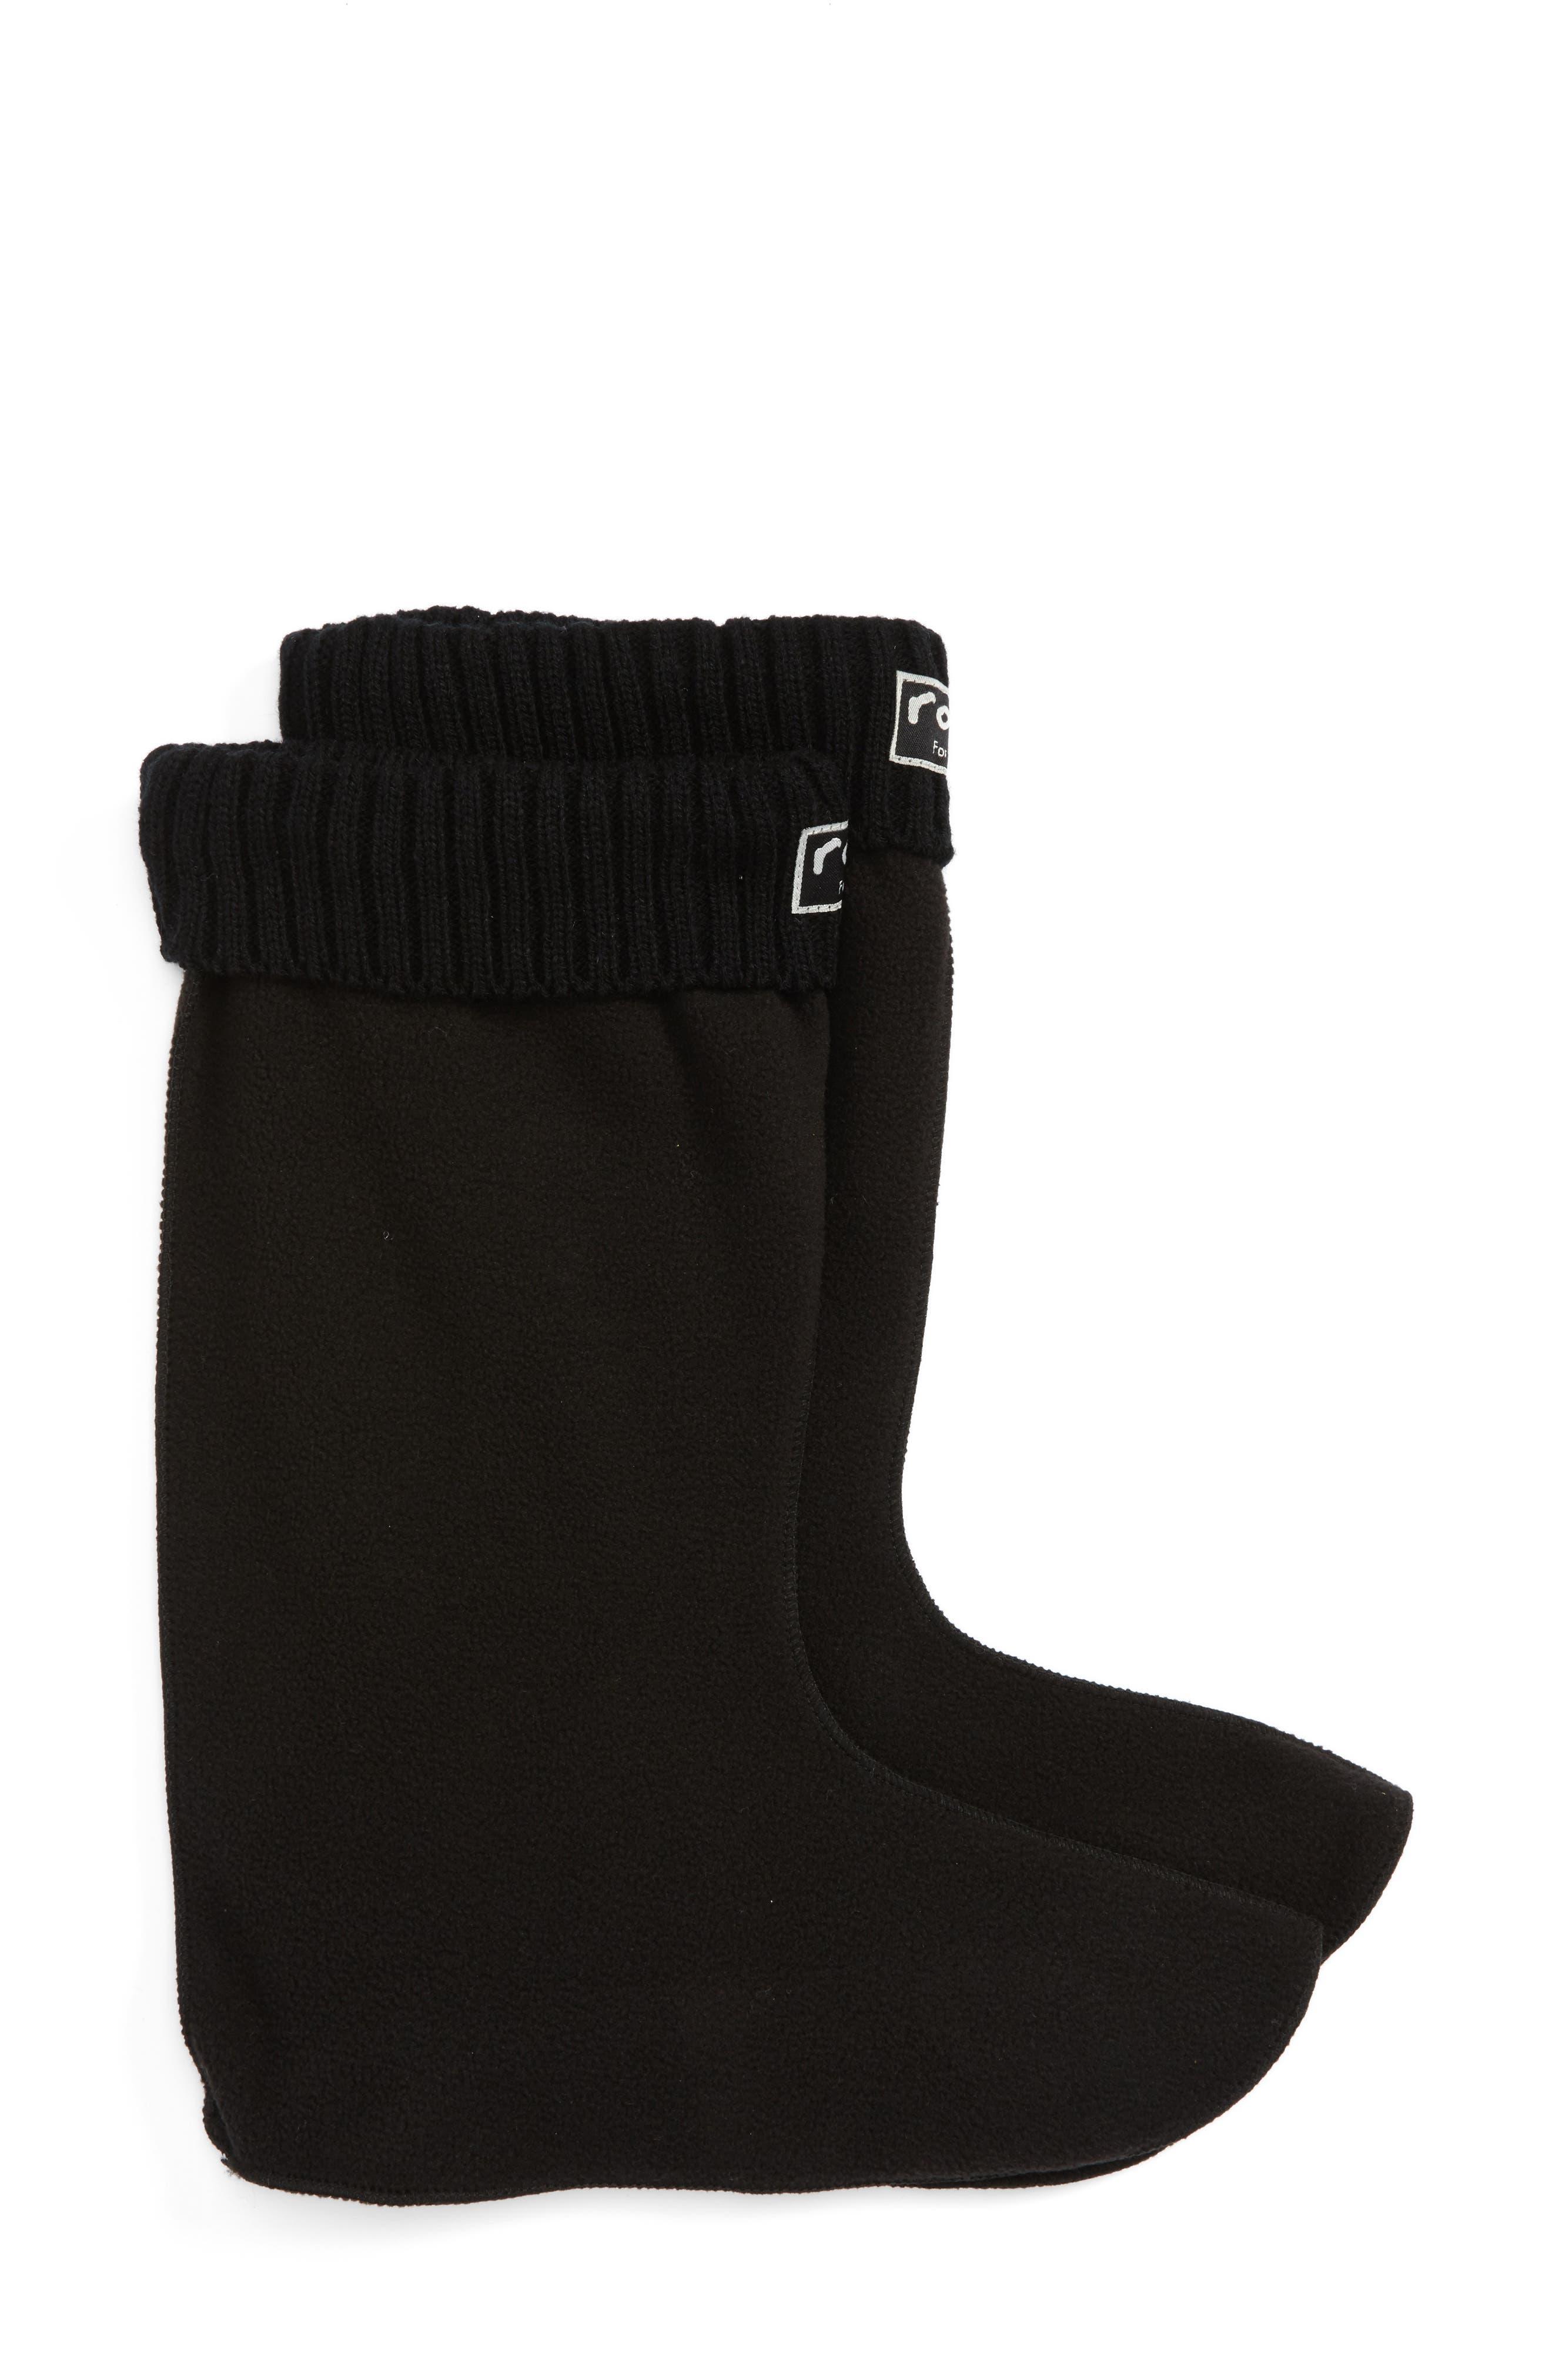 Knit Cuff Fleece Boot Socks,                             Main thumbnail 1, color,                             002